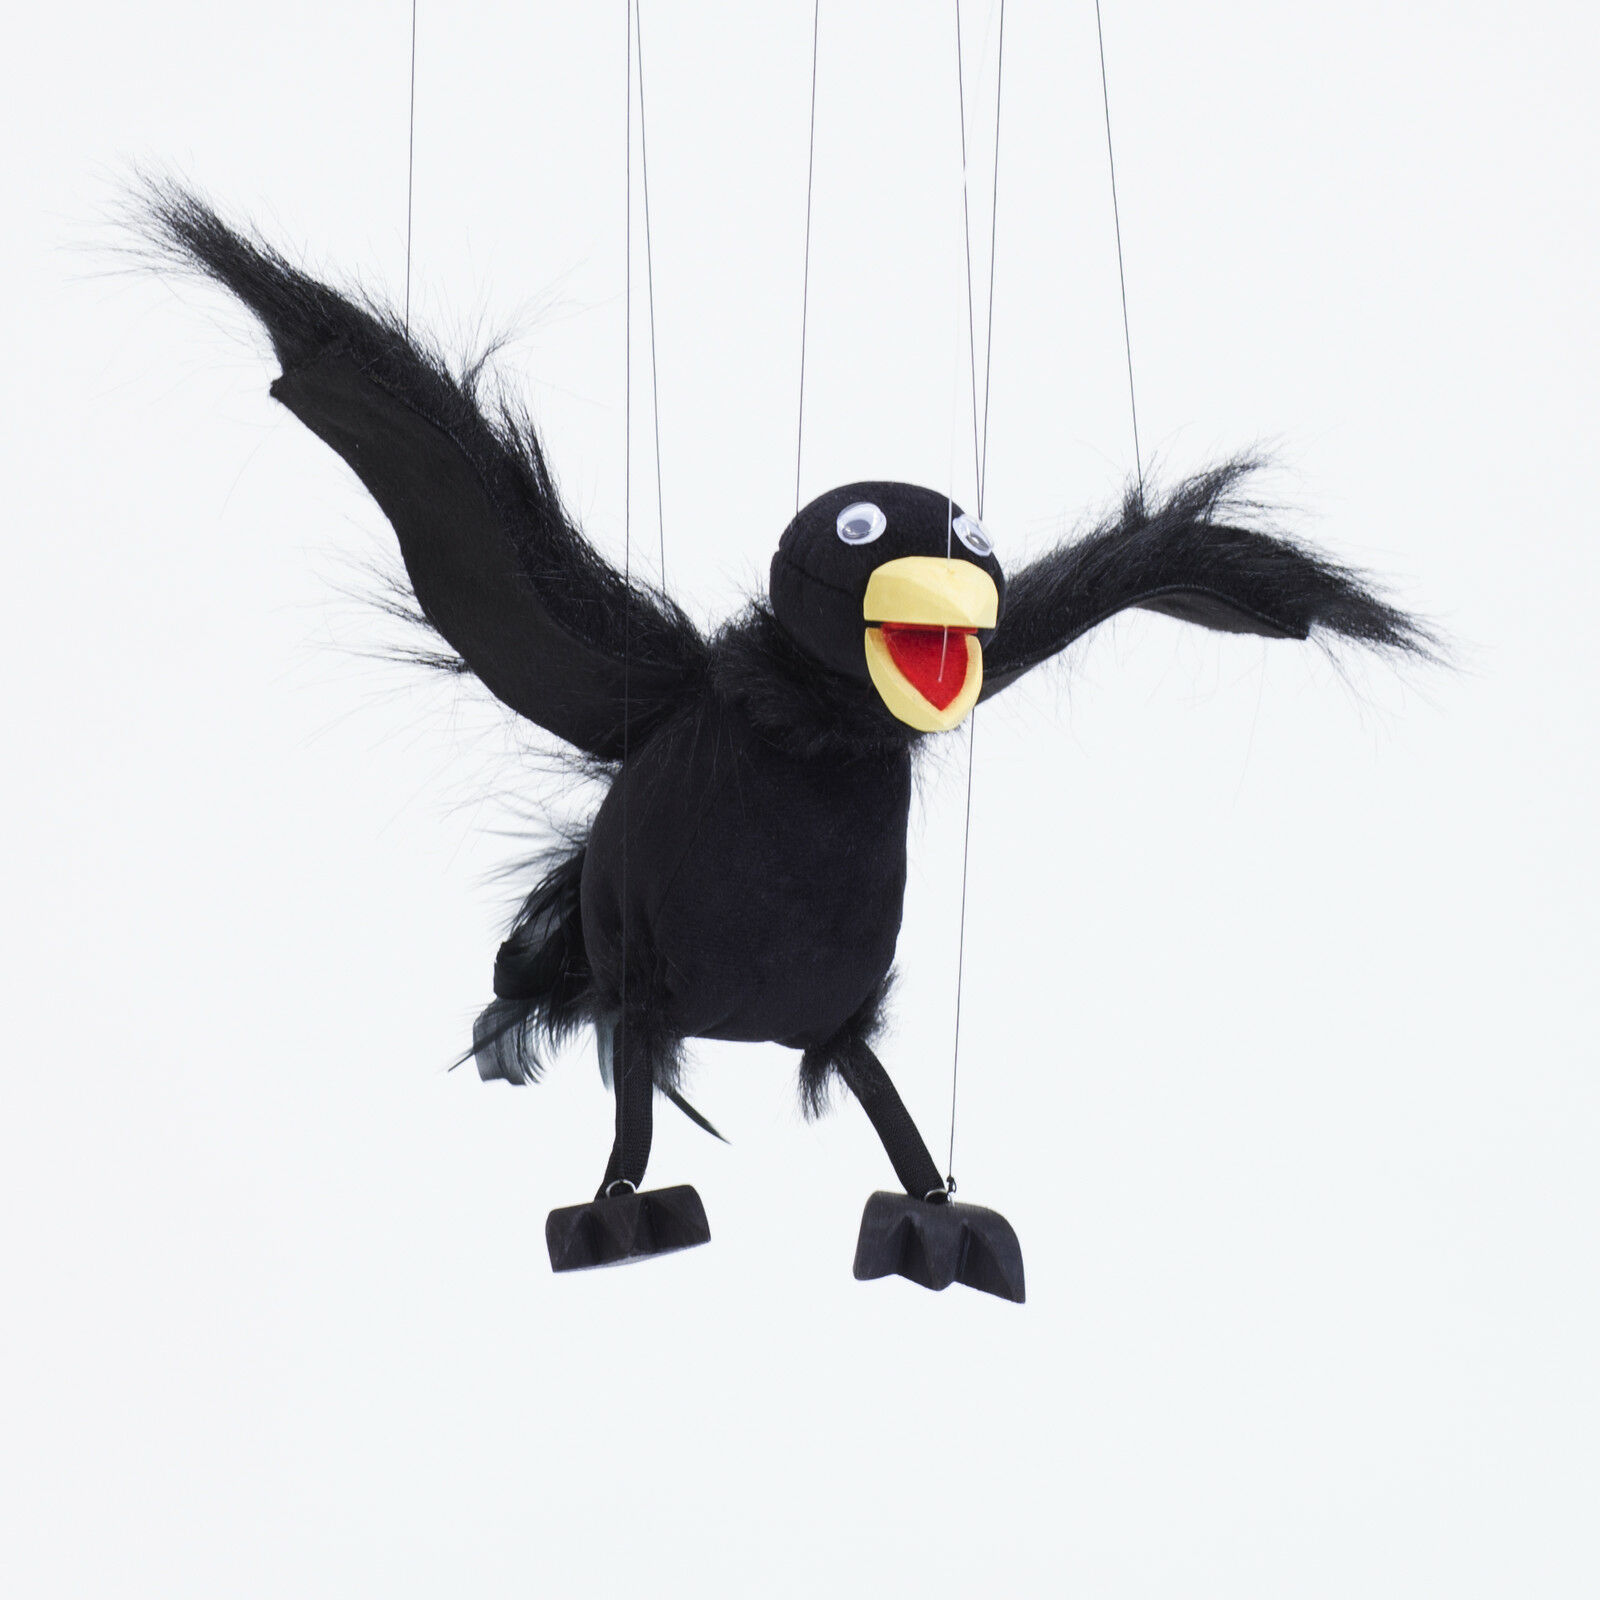 Augsburg Puppenkiste Lukulla Cuervo Marionette